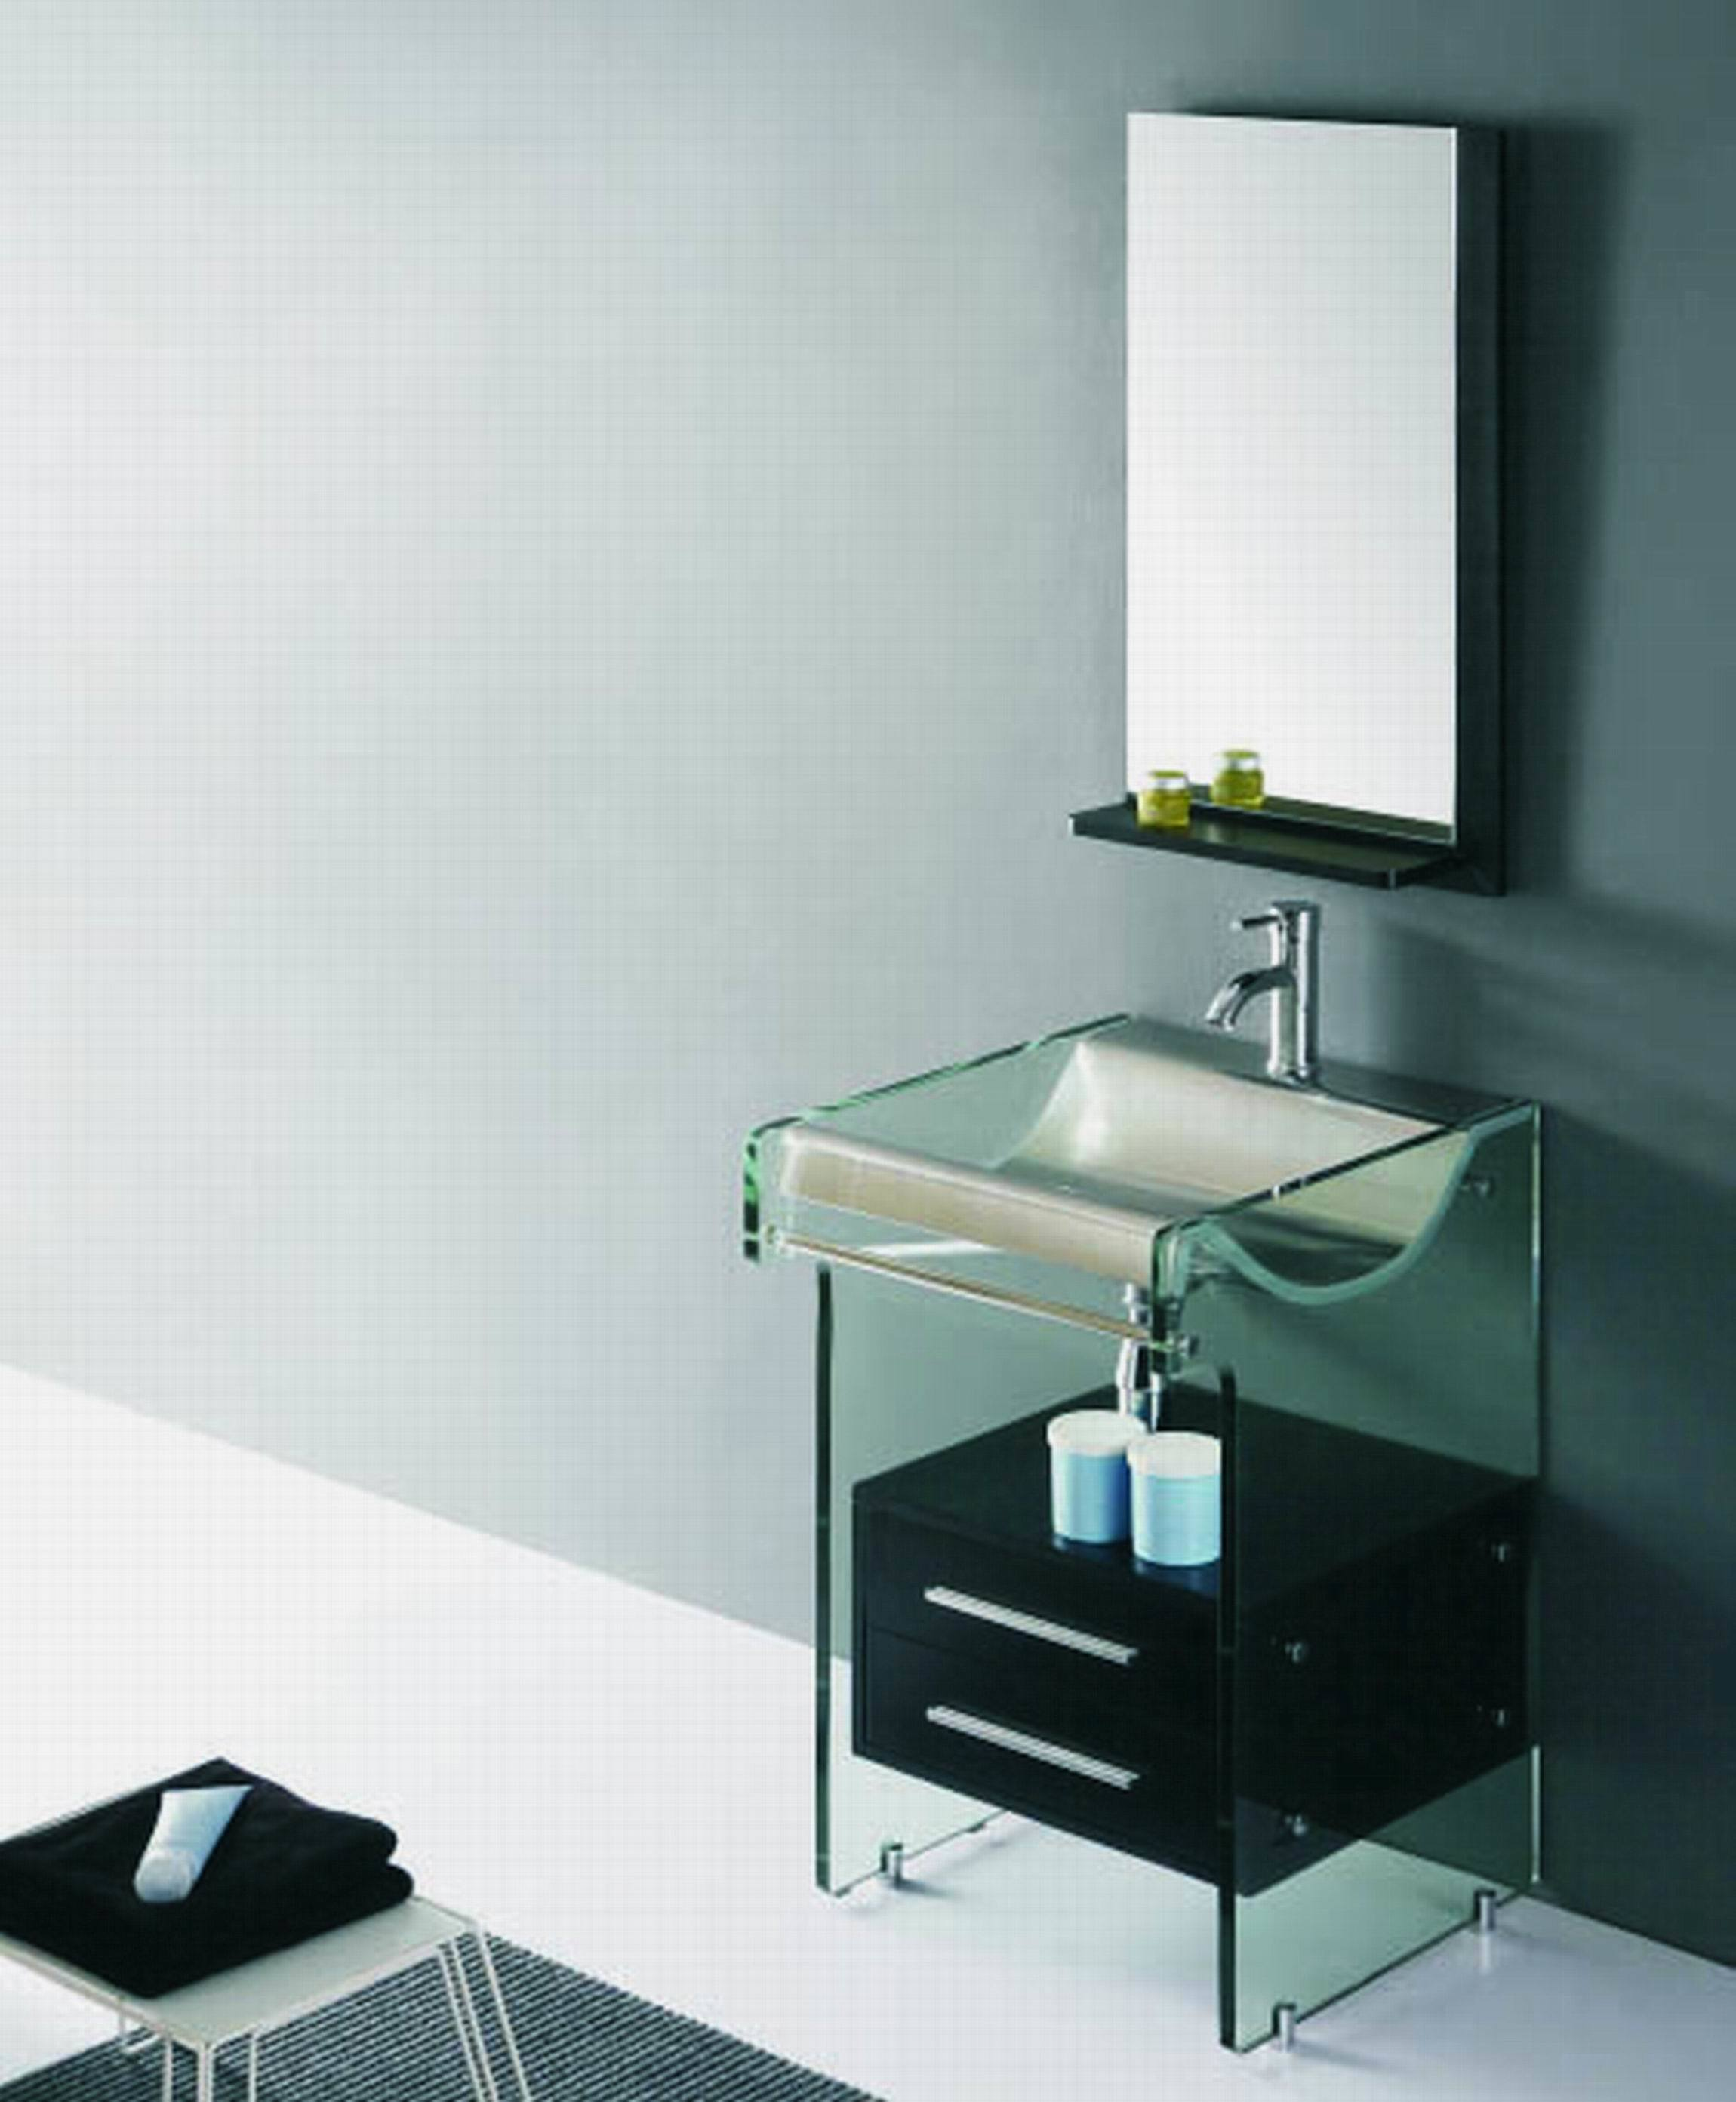 Bathroom cabinet medicine stainless steel bathroom cabinets for Bathroom cabinets 250mm